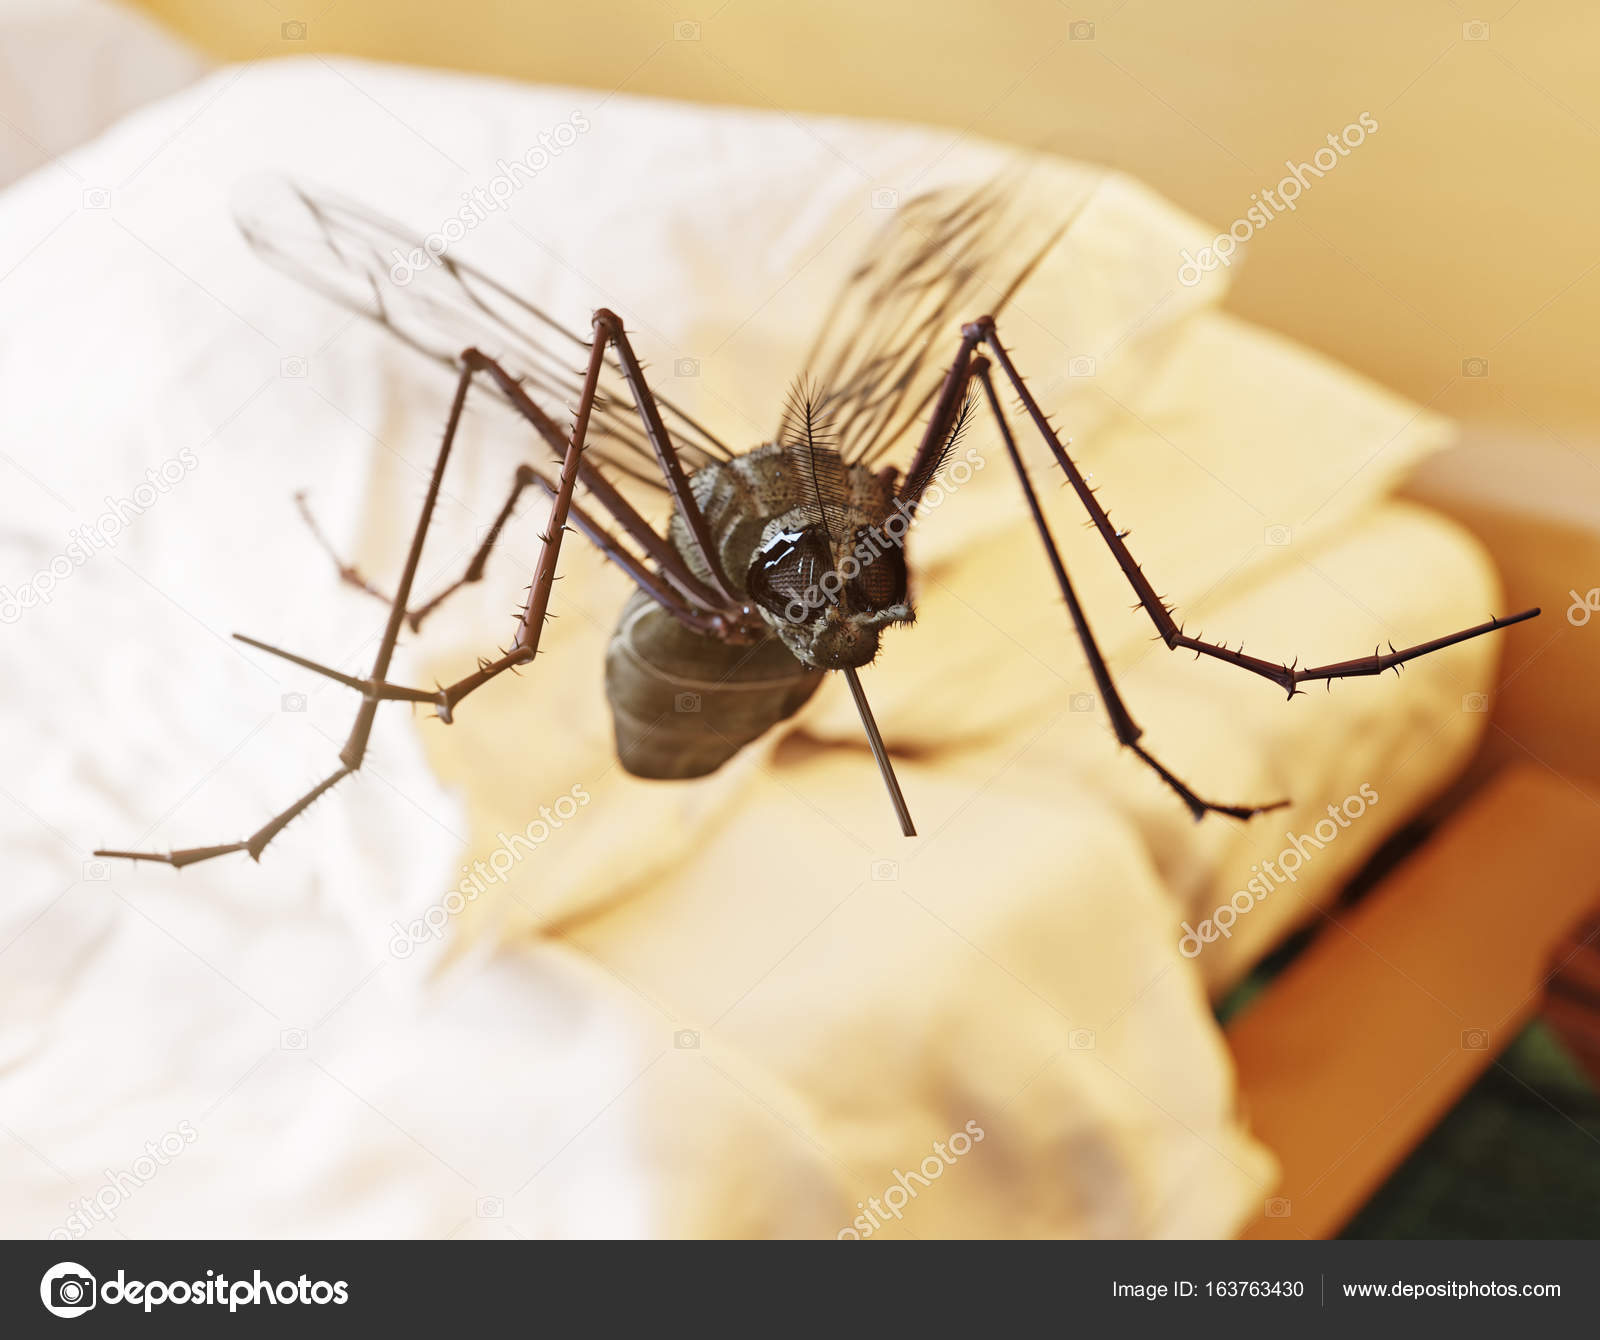 Vliegende muggen in slaapkamer — Stockfoto © vicnt2815 #163763430